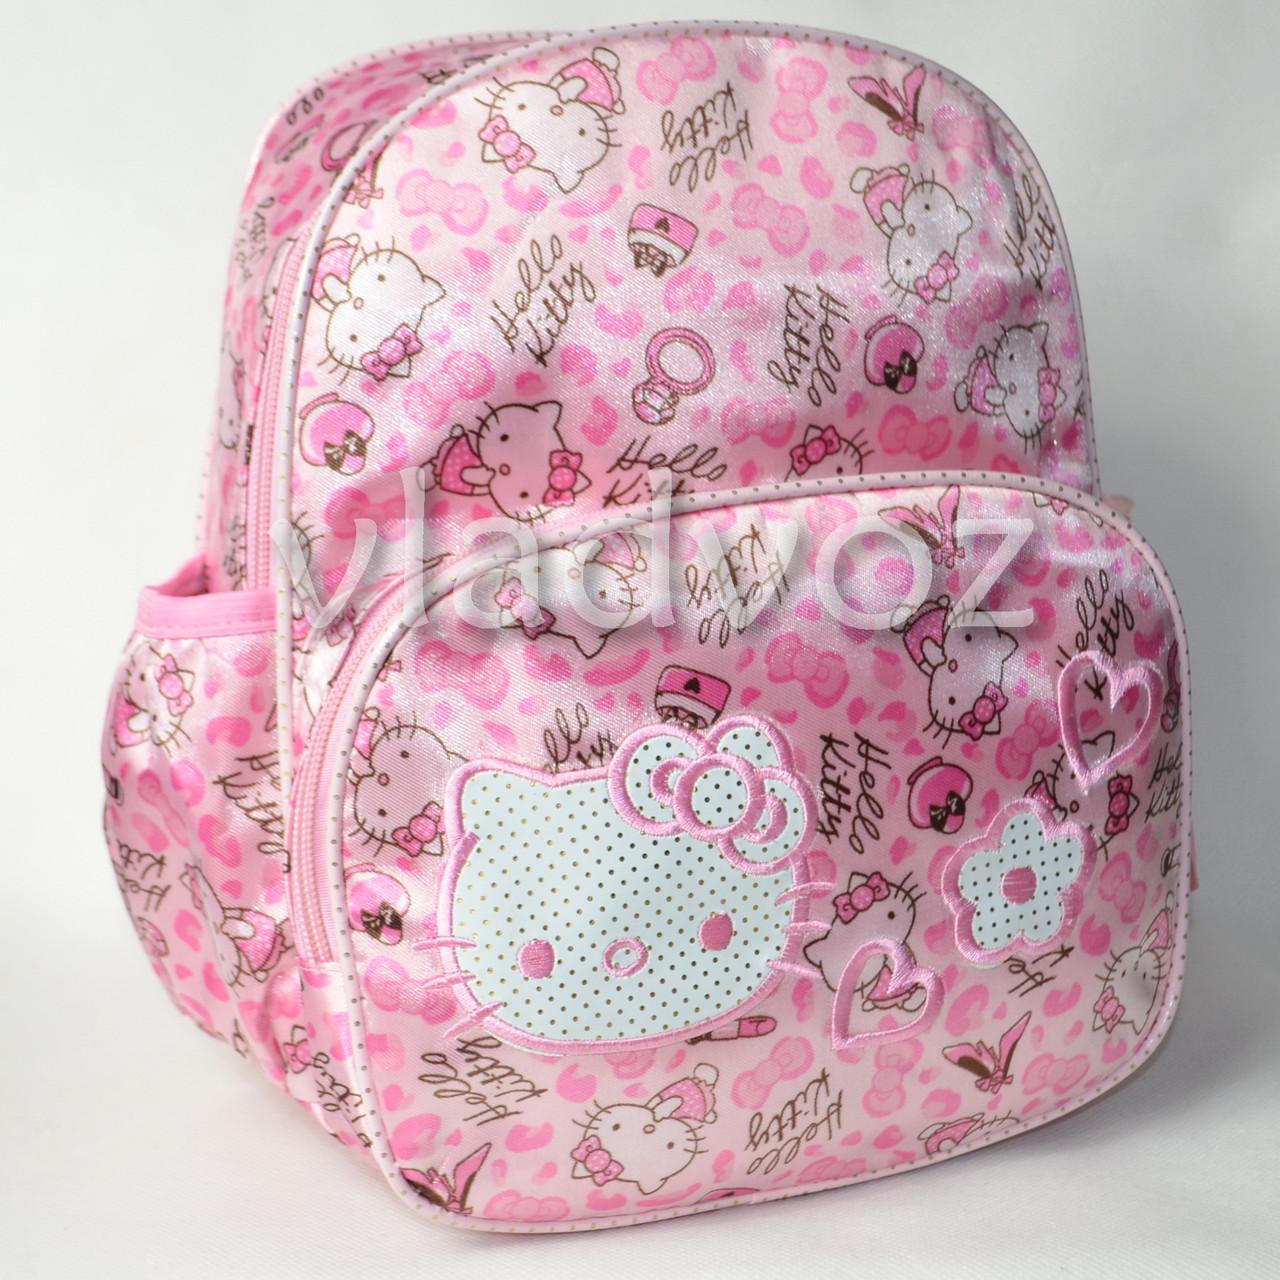 детский рюкзак hello kitty розовый